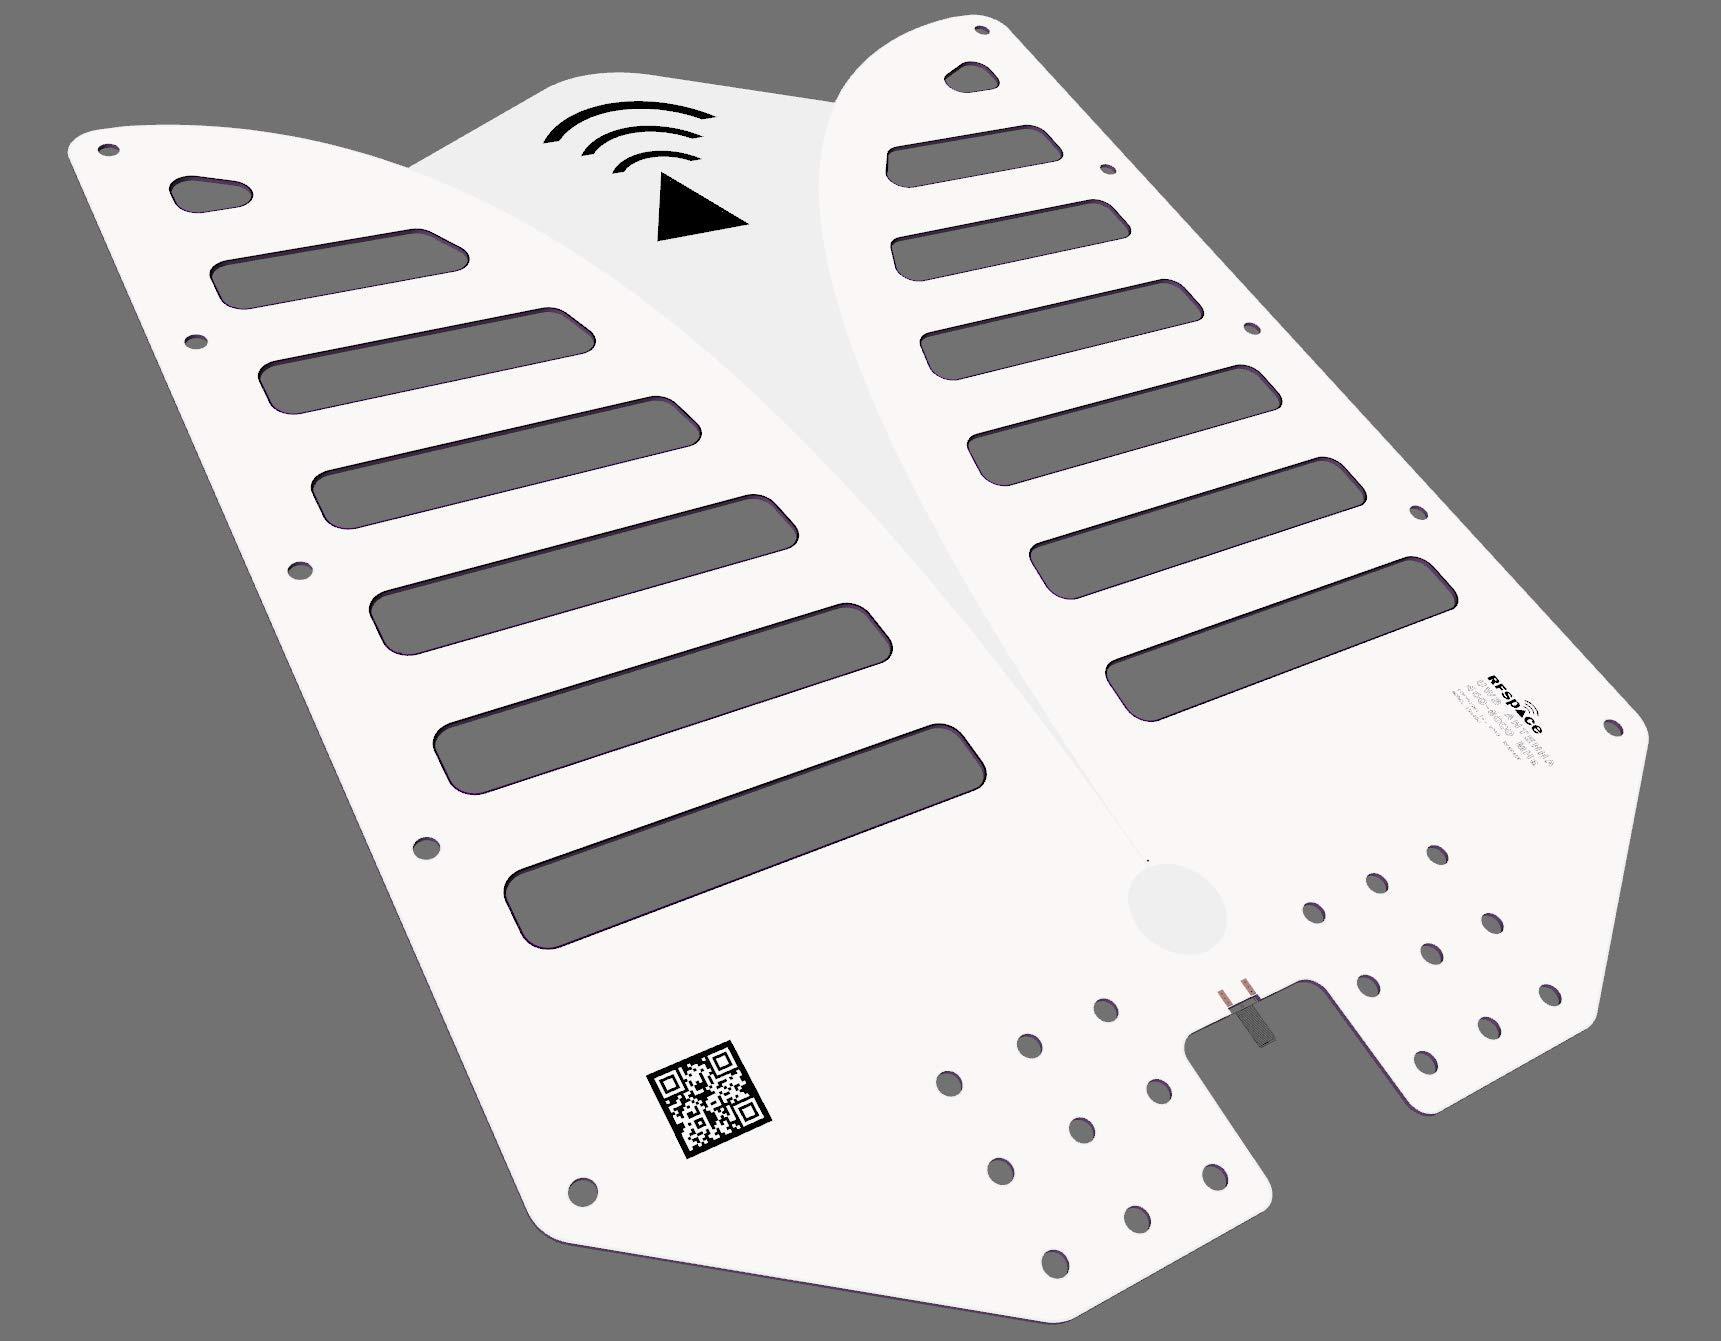 RFSPACE TSA-400 Ultra Wide Band IoT Antenna 375 MHz - 6 GHz for UWB TX/RX SDR Radar IOT GPR SIGINT EMC Test ADSB WiFi FVP Drone Video Vivaldi Antenna